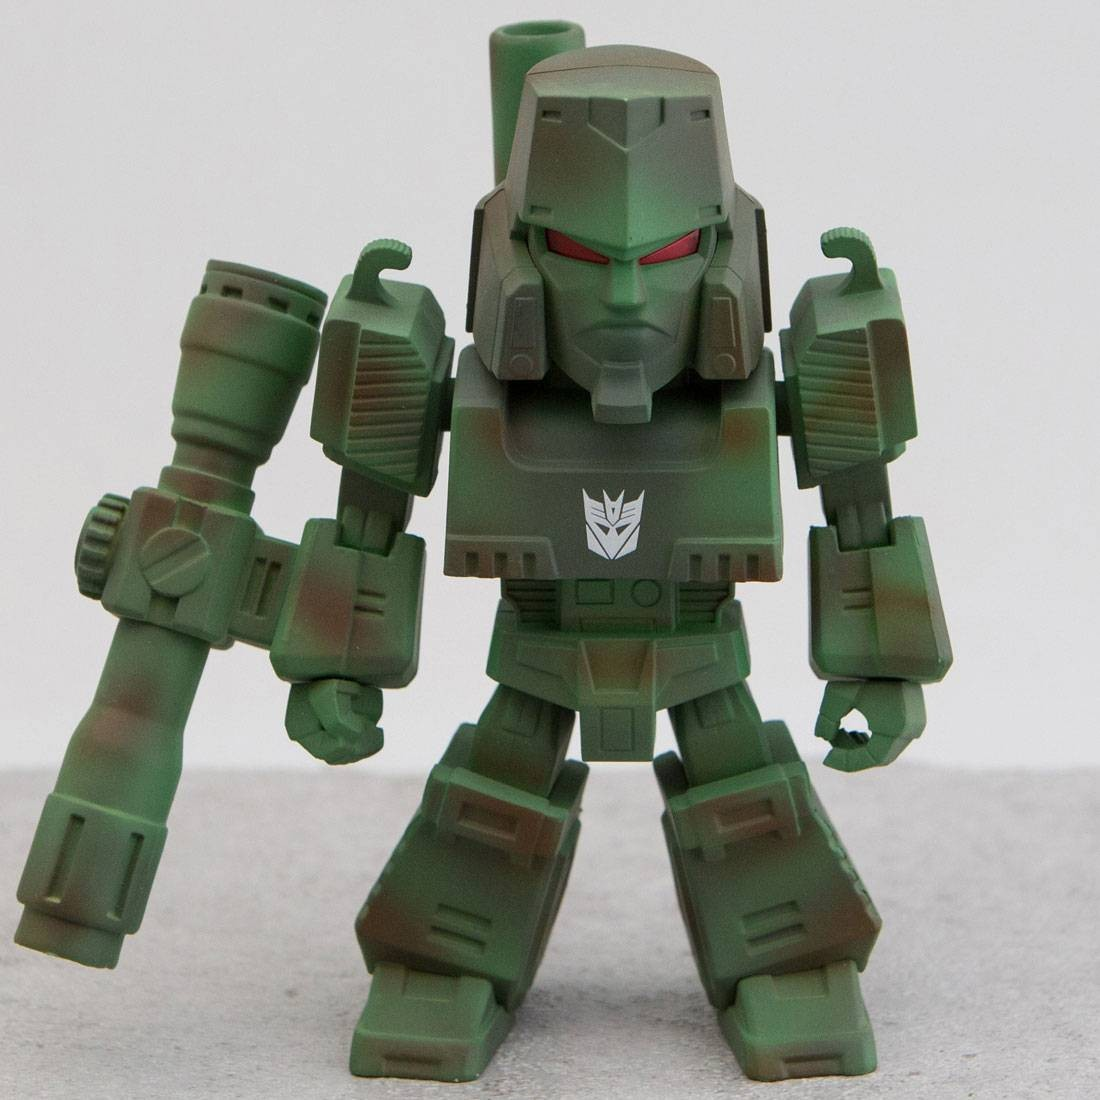 BAIT x Transformers x Switch Collectibles Megatron 4.5 Inch Figure - Camo Edition